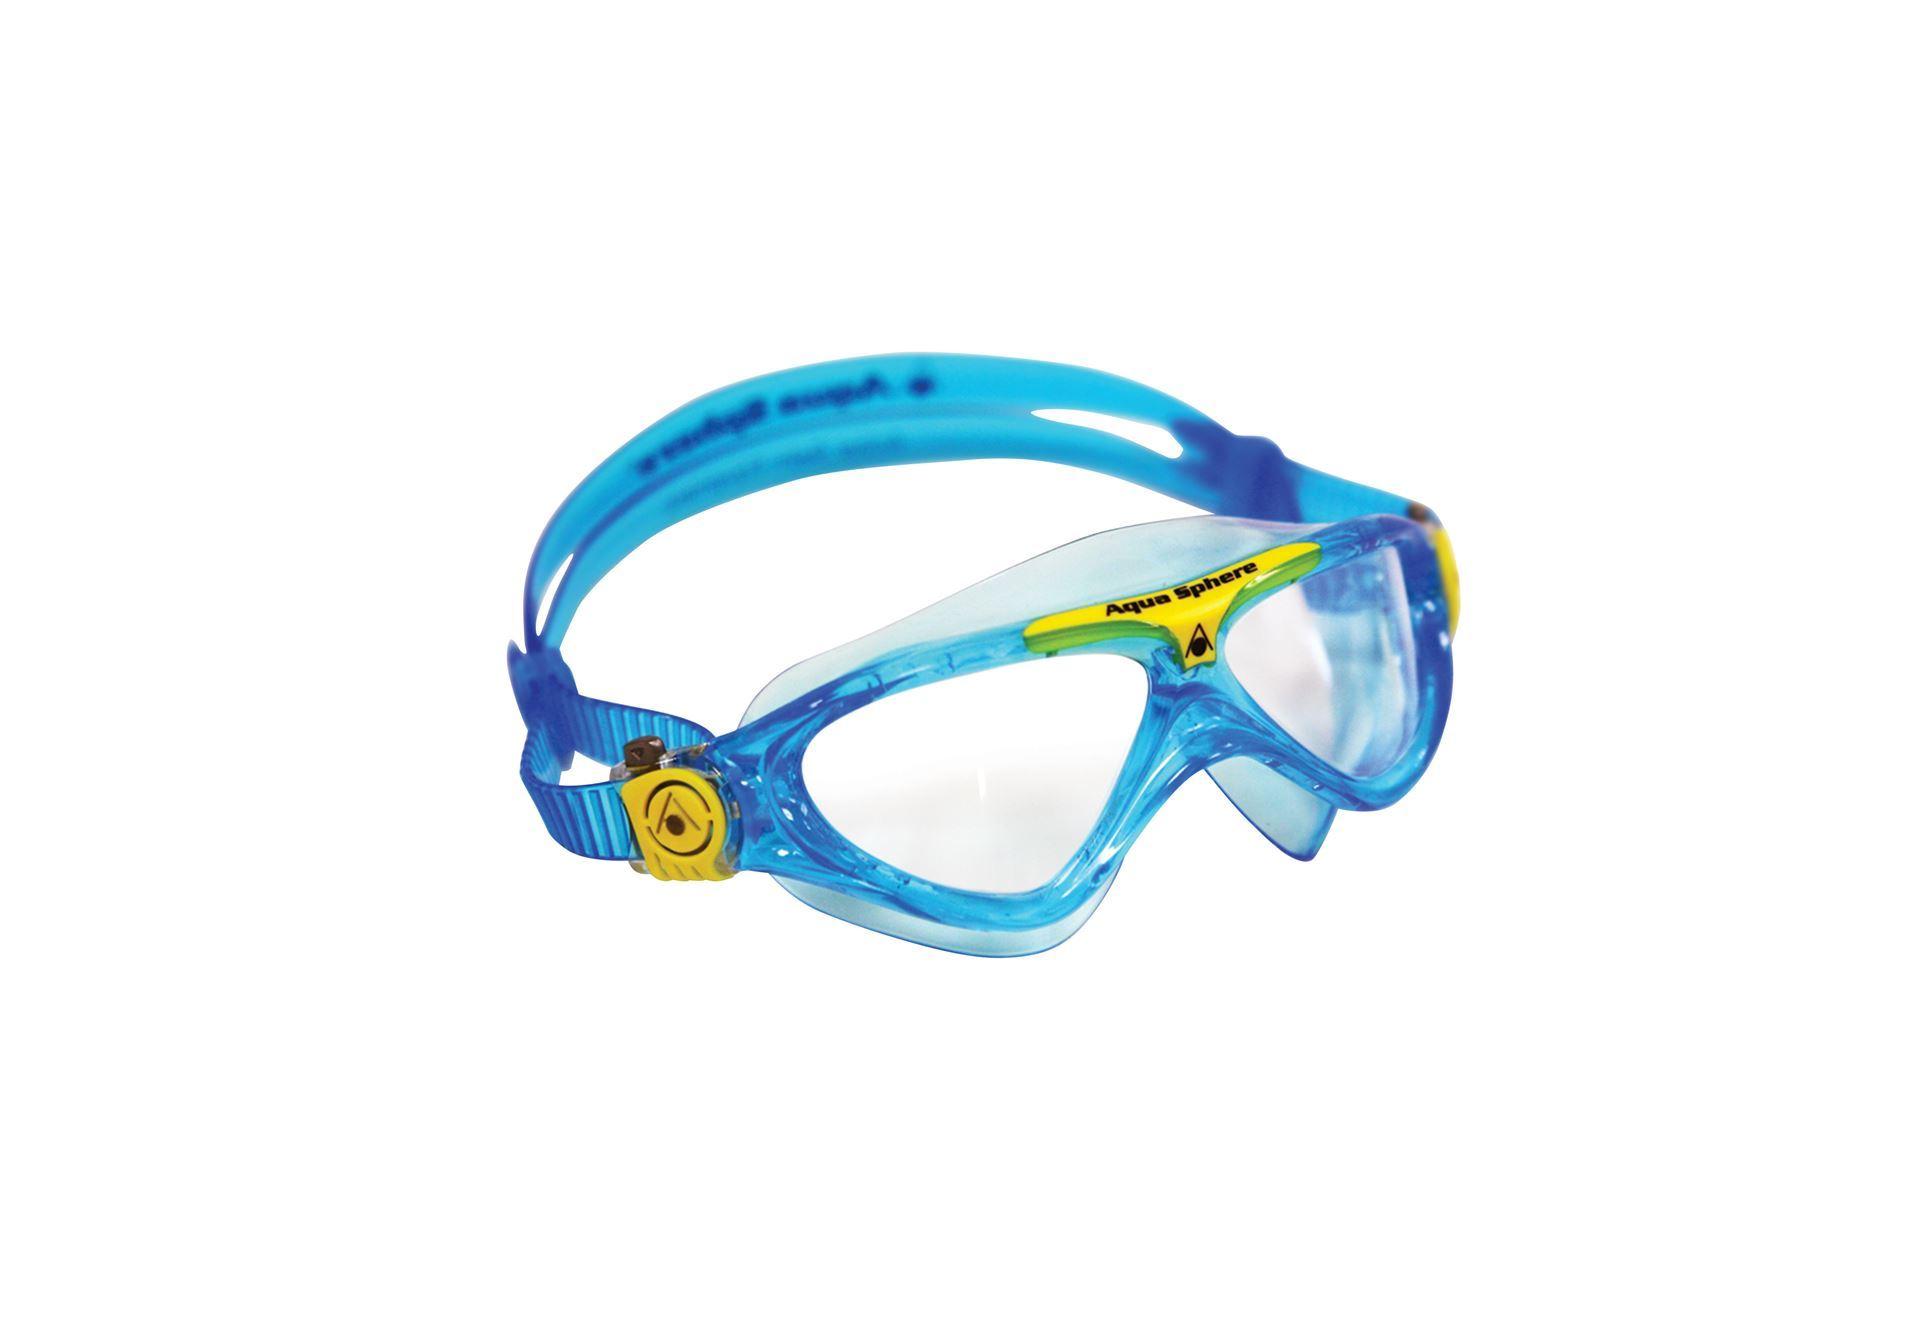 Aqua Sphere - Vista Junior Tri Svømmebrille 4-14 år thumbnail